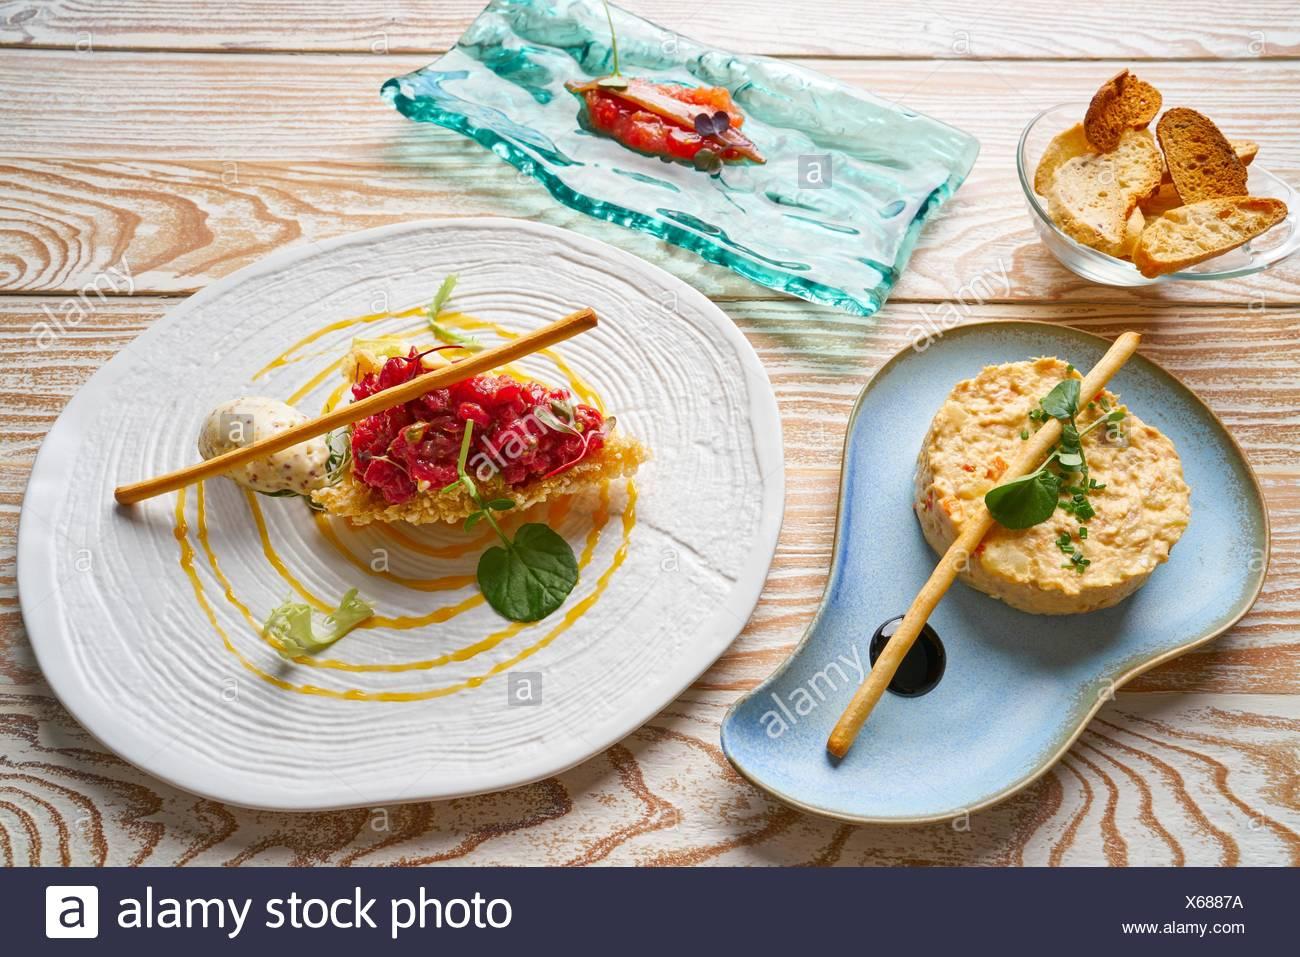 food starters potato salad Steak tartare and Anchovies with tomato Tapas. - Stock Image